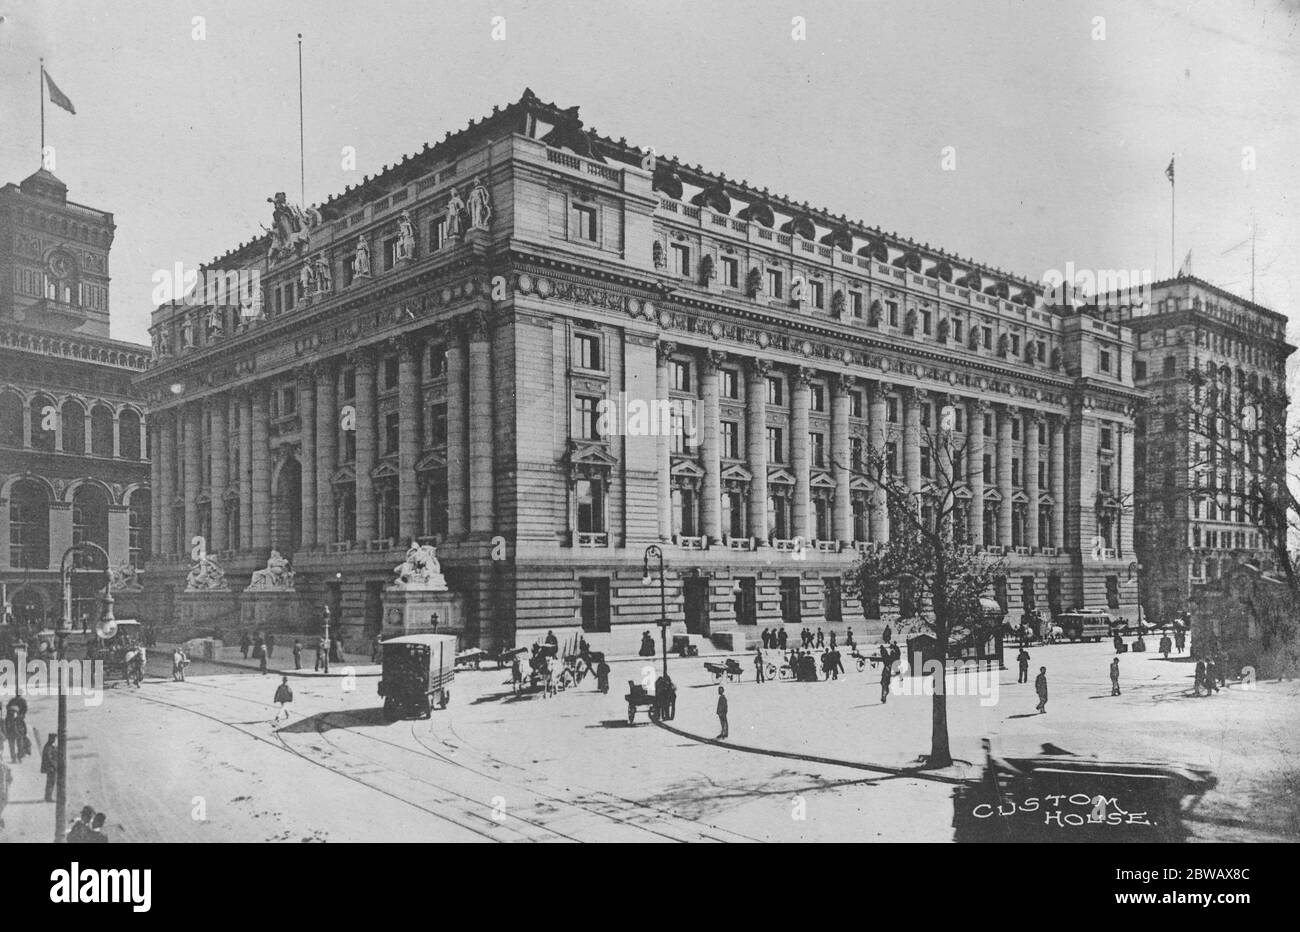 The New York Custom House America 21 September 1920 Stock Photo Alamy